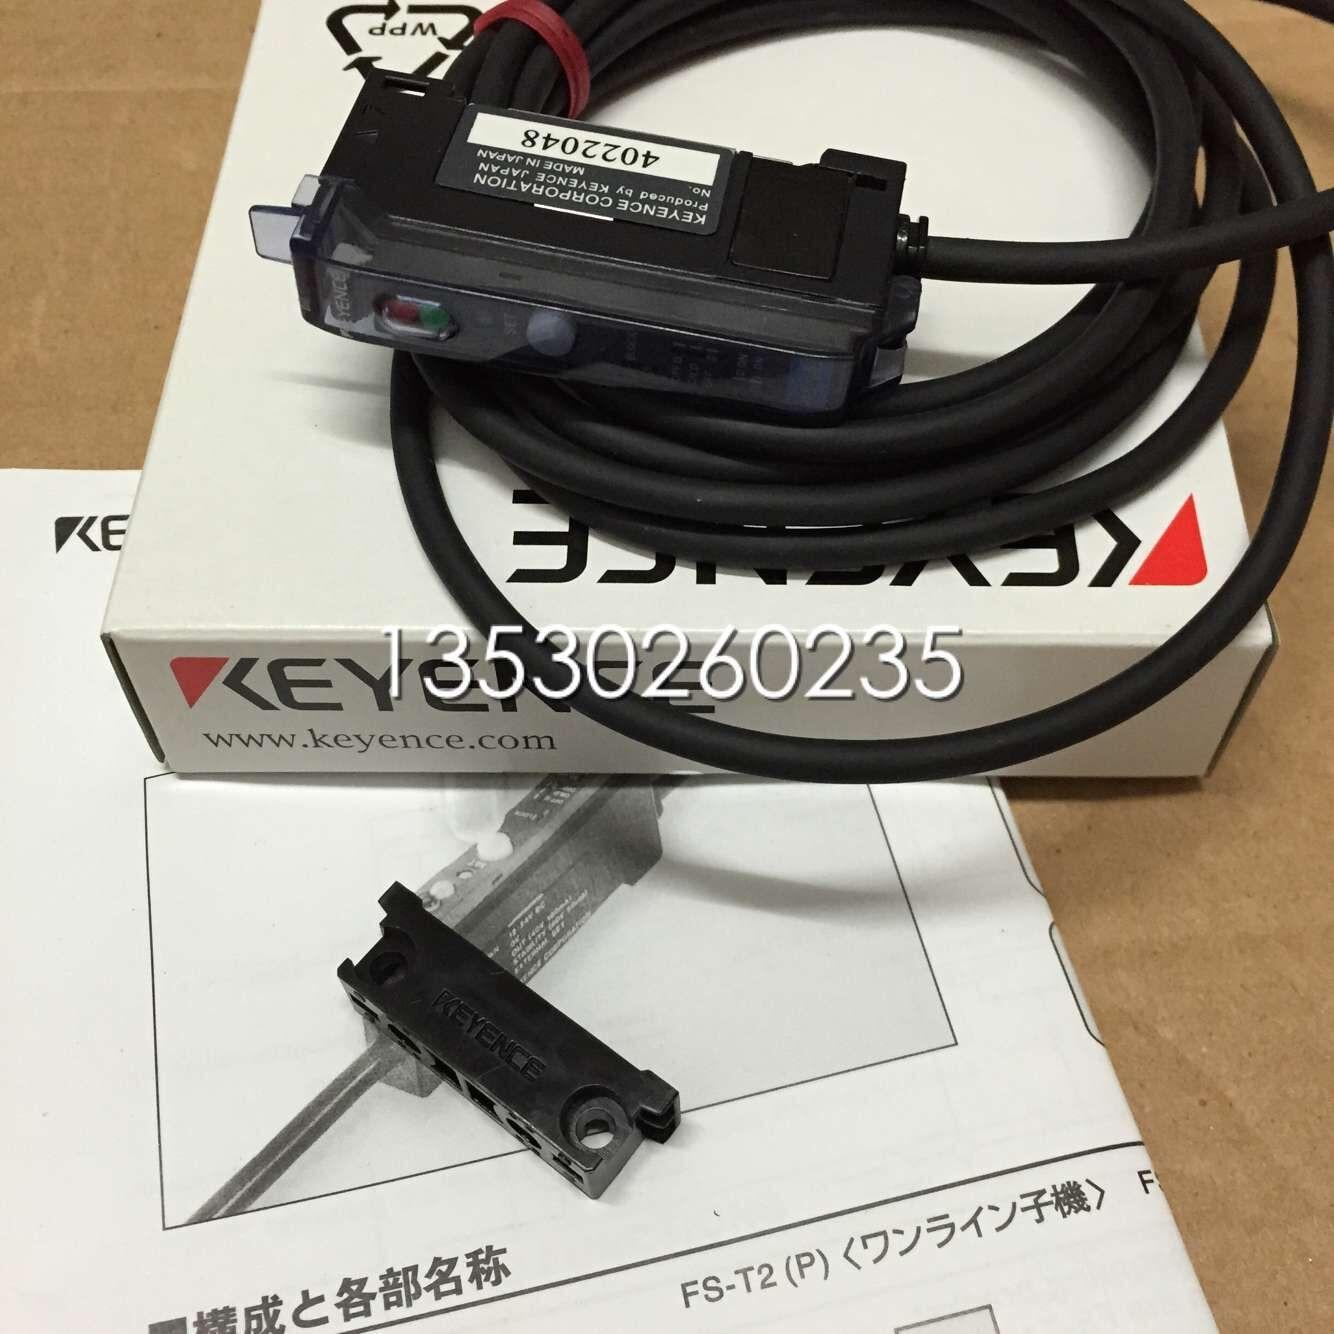 FS-T1G  Photoelectric Switch e3x da21 s photoelectric switch